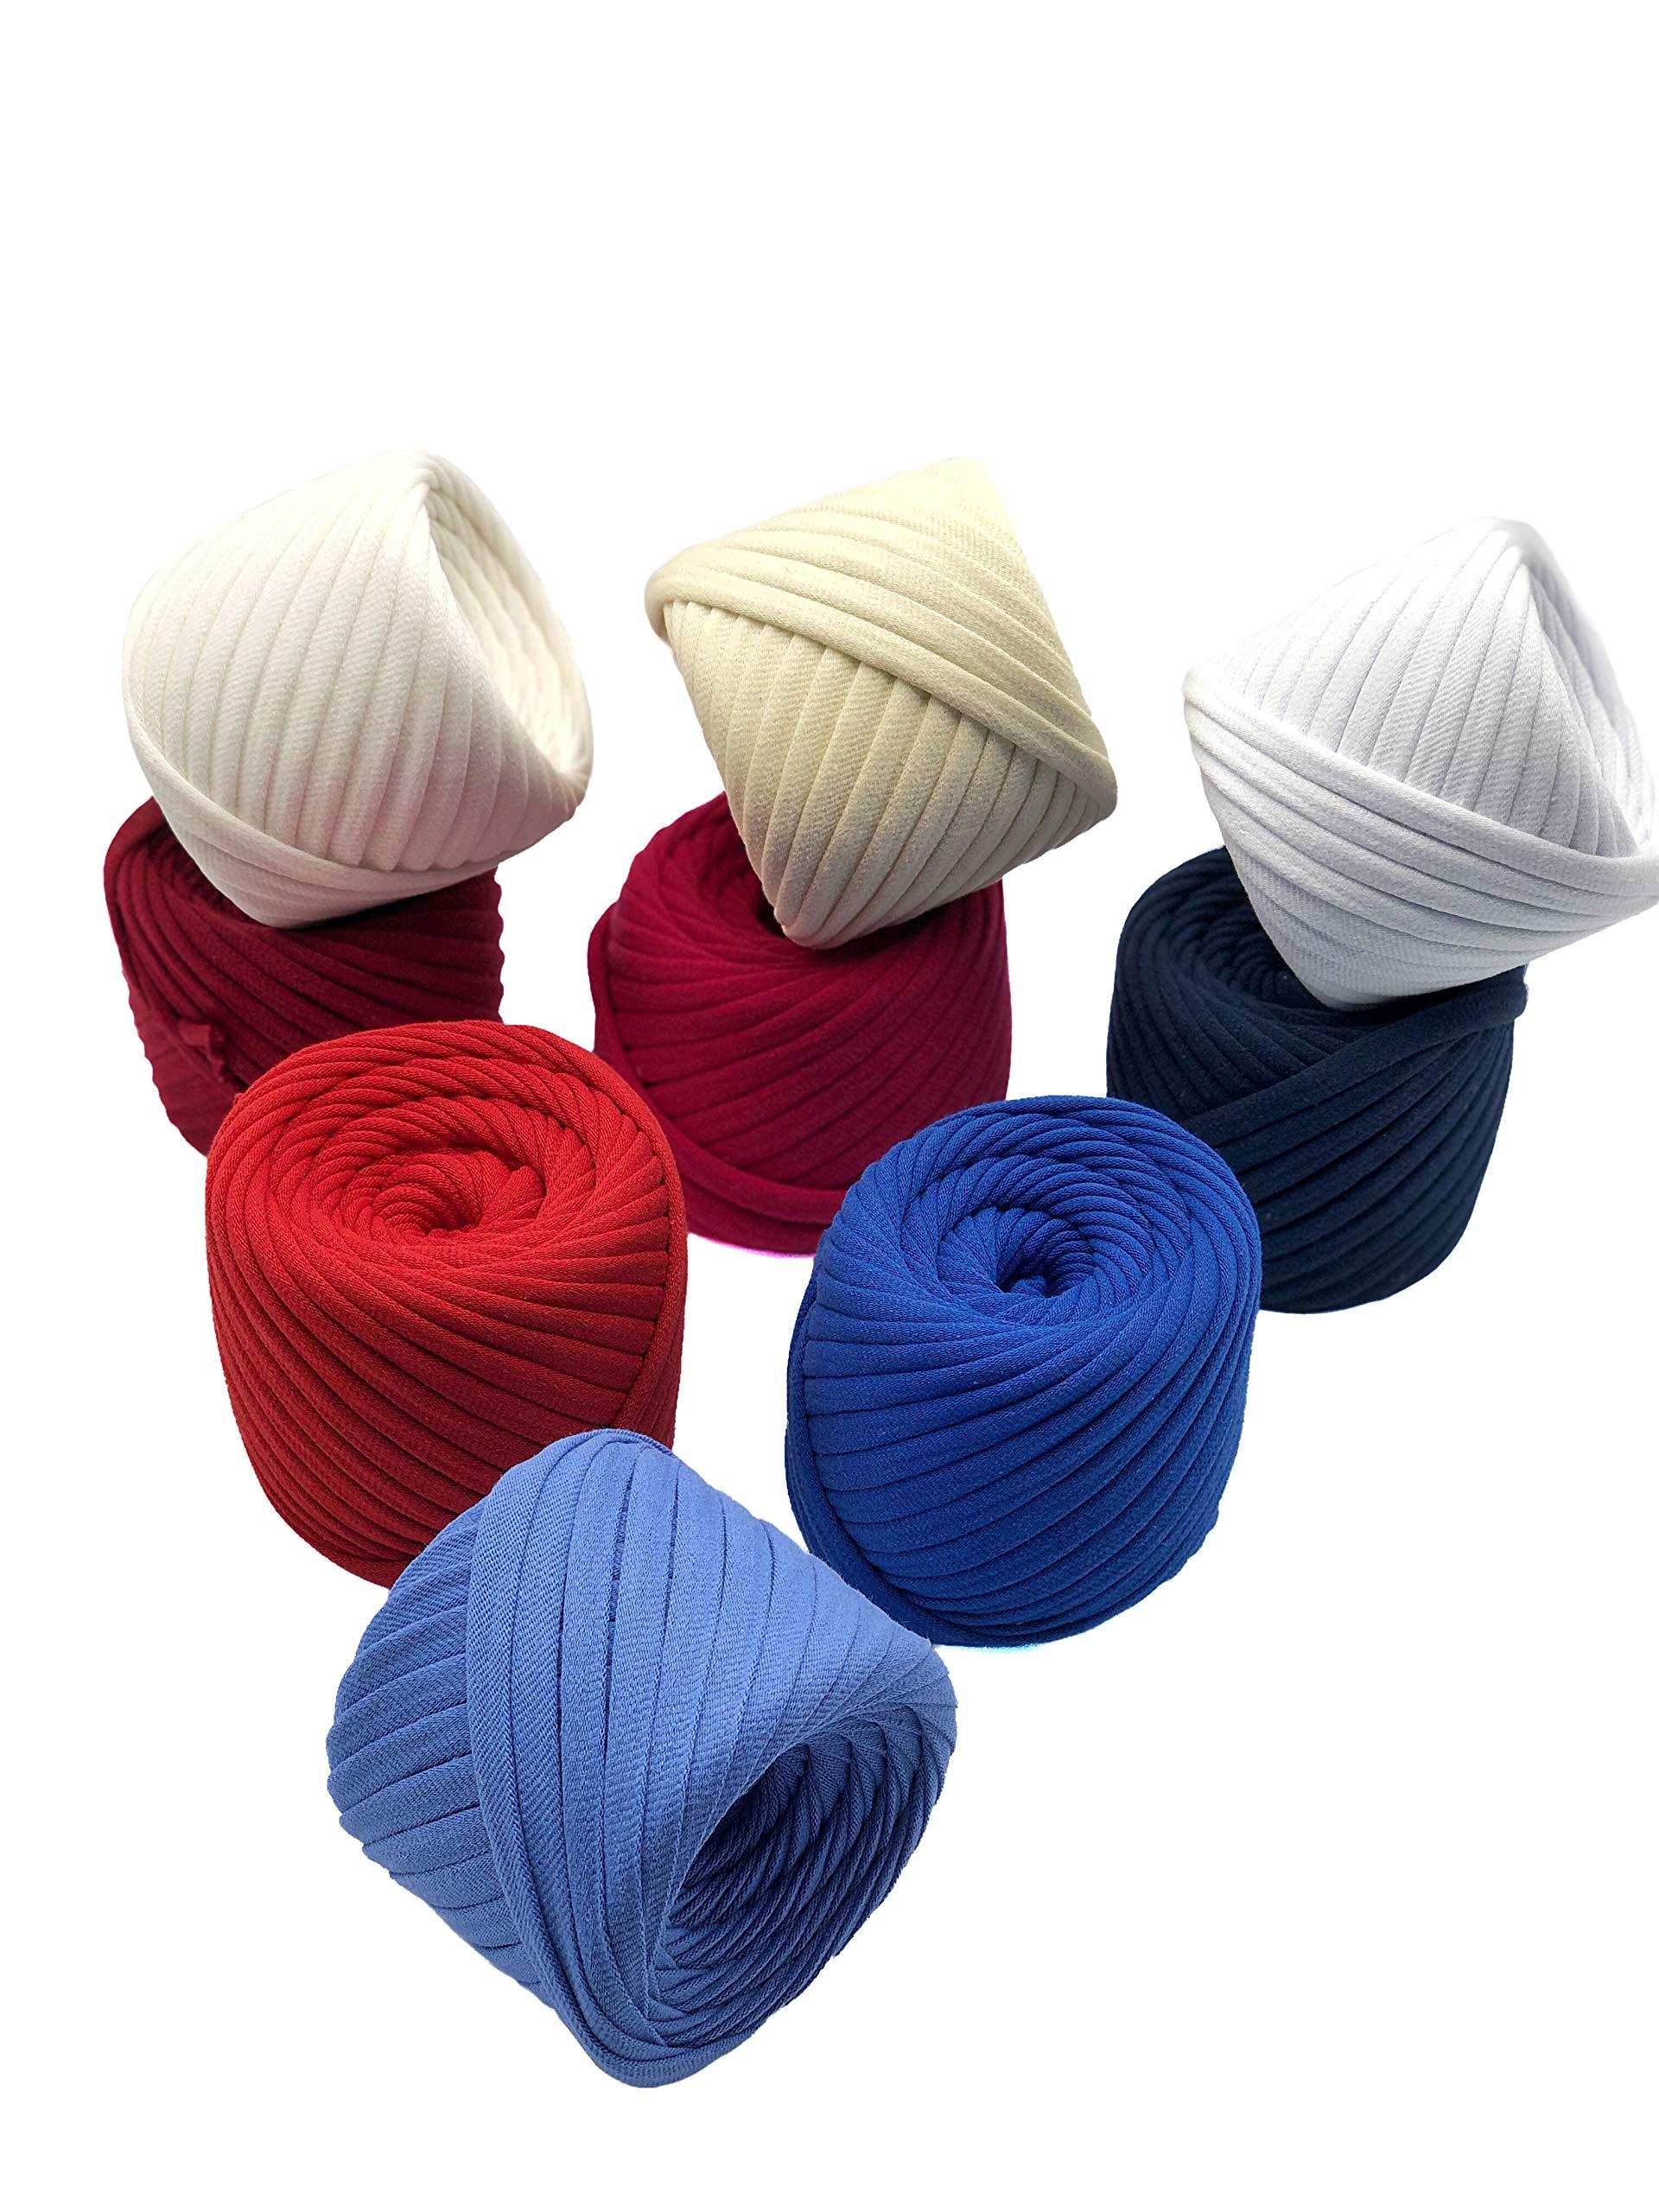 T-Shirt Yarn Fettuccini Zpagetti Set - 9 Balls Total of 196 Yards - Tshirt Yarn Kit for Crocheting - Ribbon Yarn 100% Cotton - Knitting Yarn Ball - T Yarn Organic - T-Yarn American Set